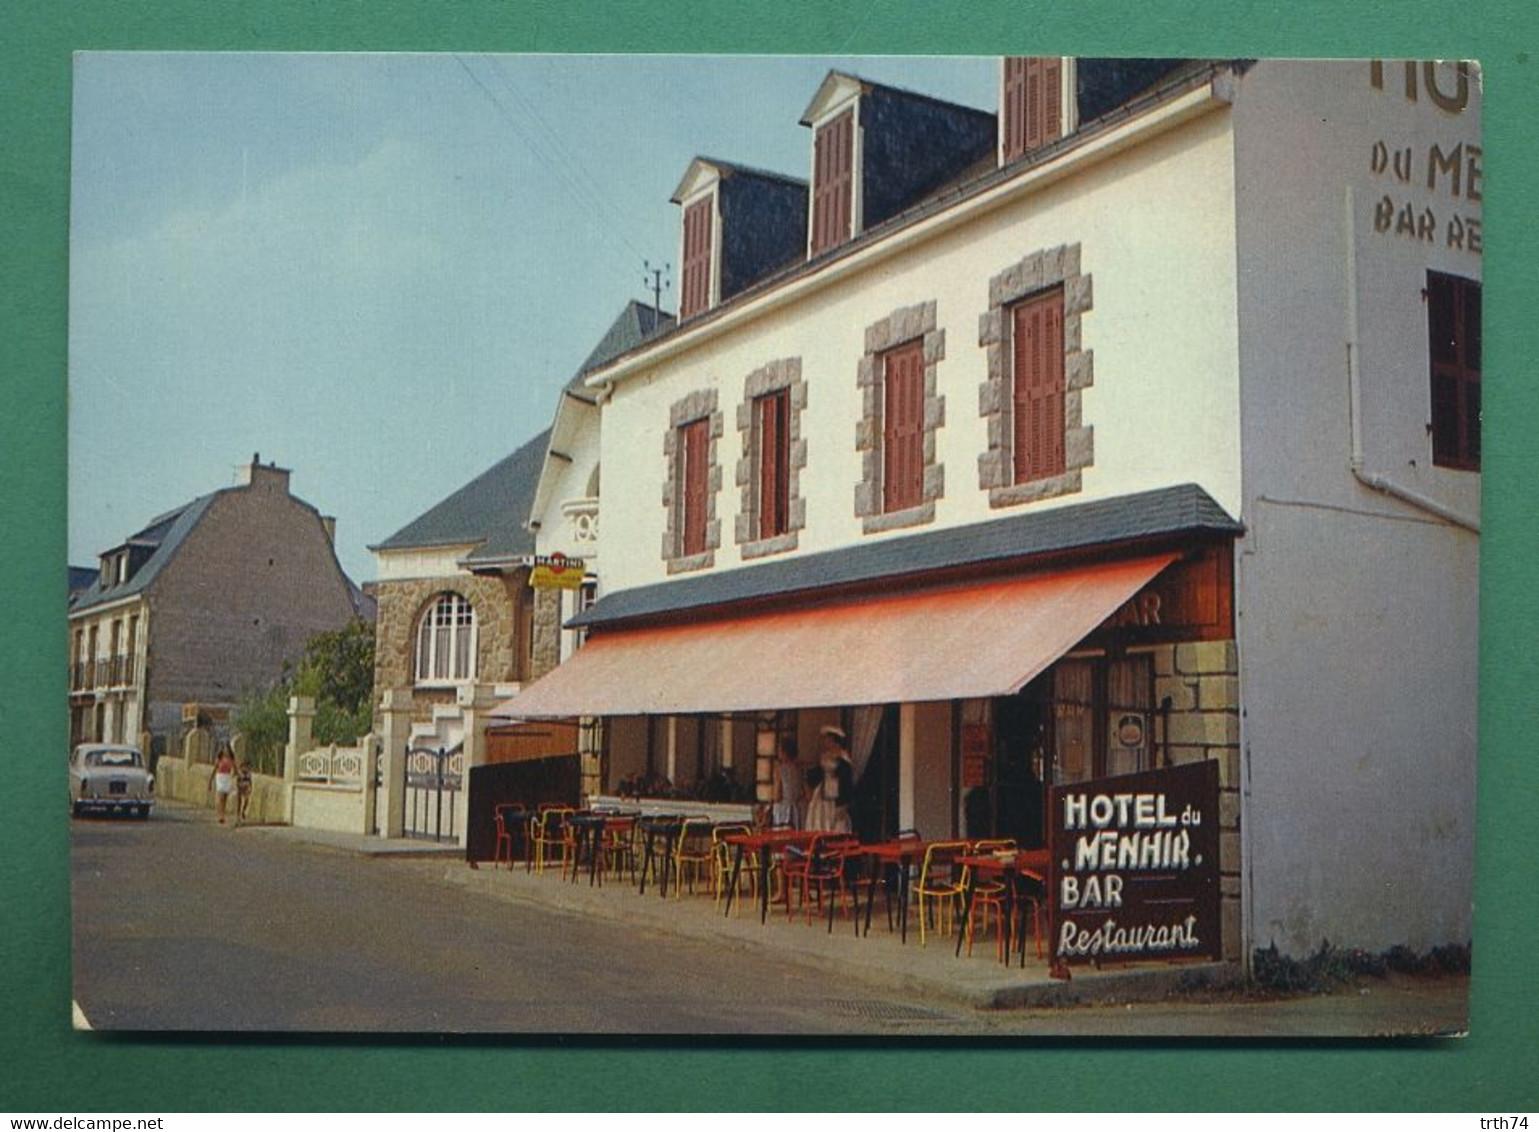 56 Locmariaquer Hôtel Du Menhir ( Bar, Restaurant, Voiture Peugeot 403 ) - Locmariaquer